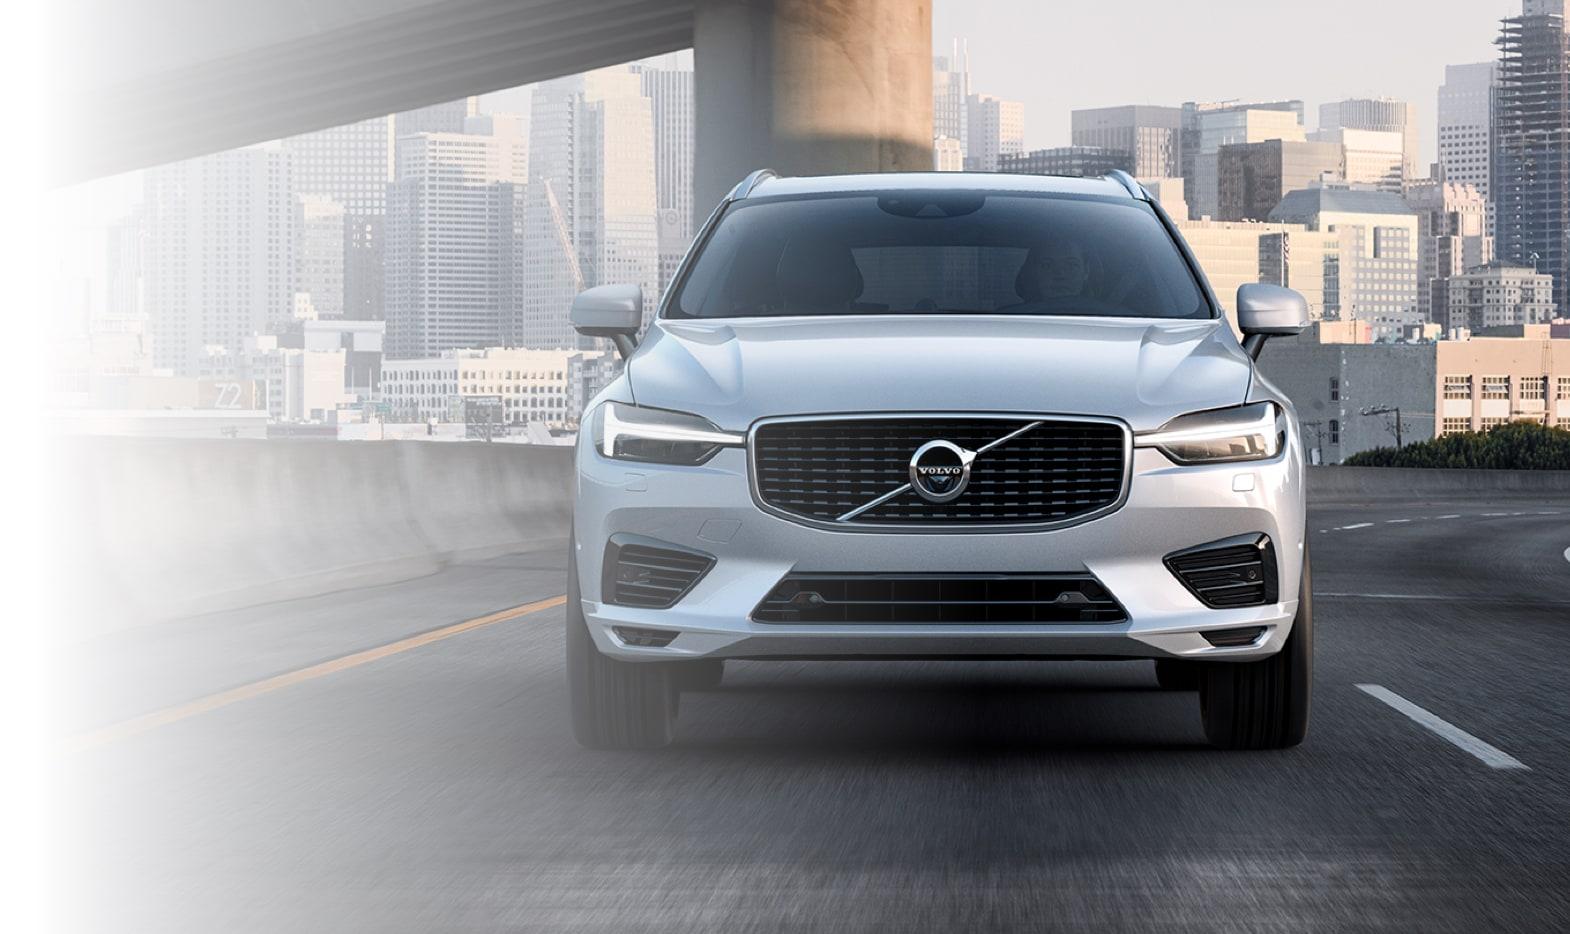 Volvo Dealership Near Me >> New 2019 Volvo Used Car Dealer West Springfield Ma Volvo